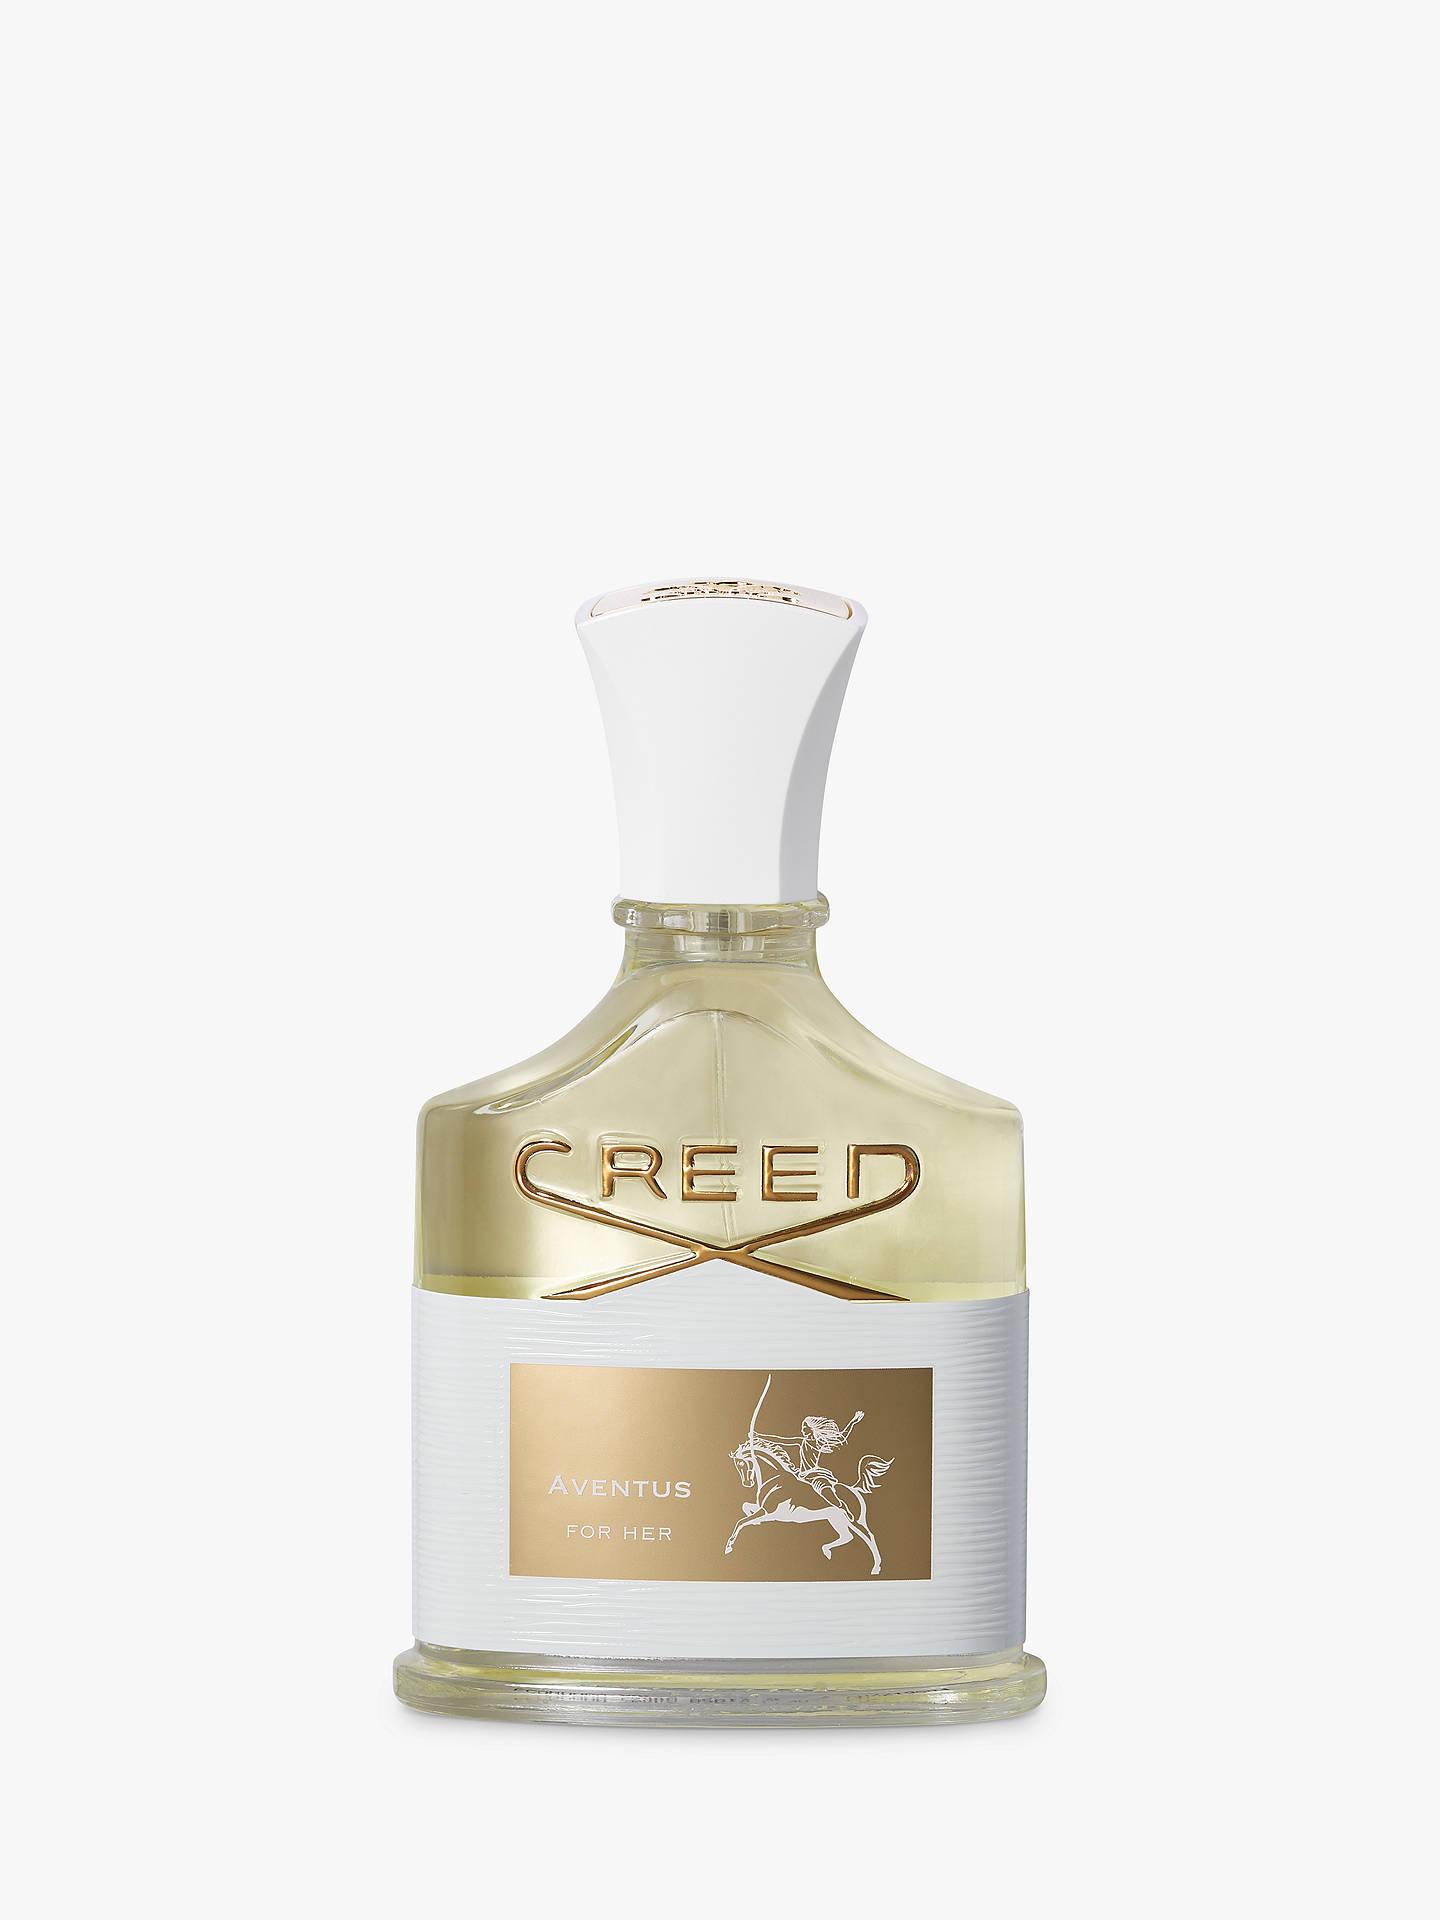 Creed Aventus For Her Eau De Parfum 75ml At John Lewis Partners